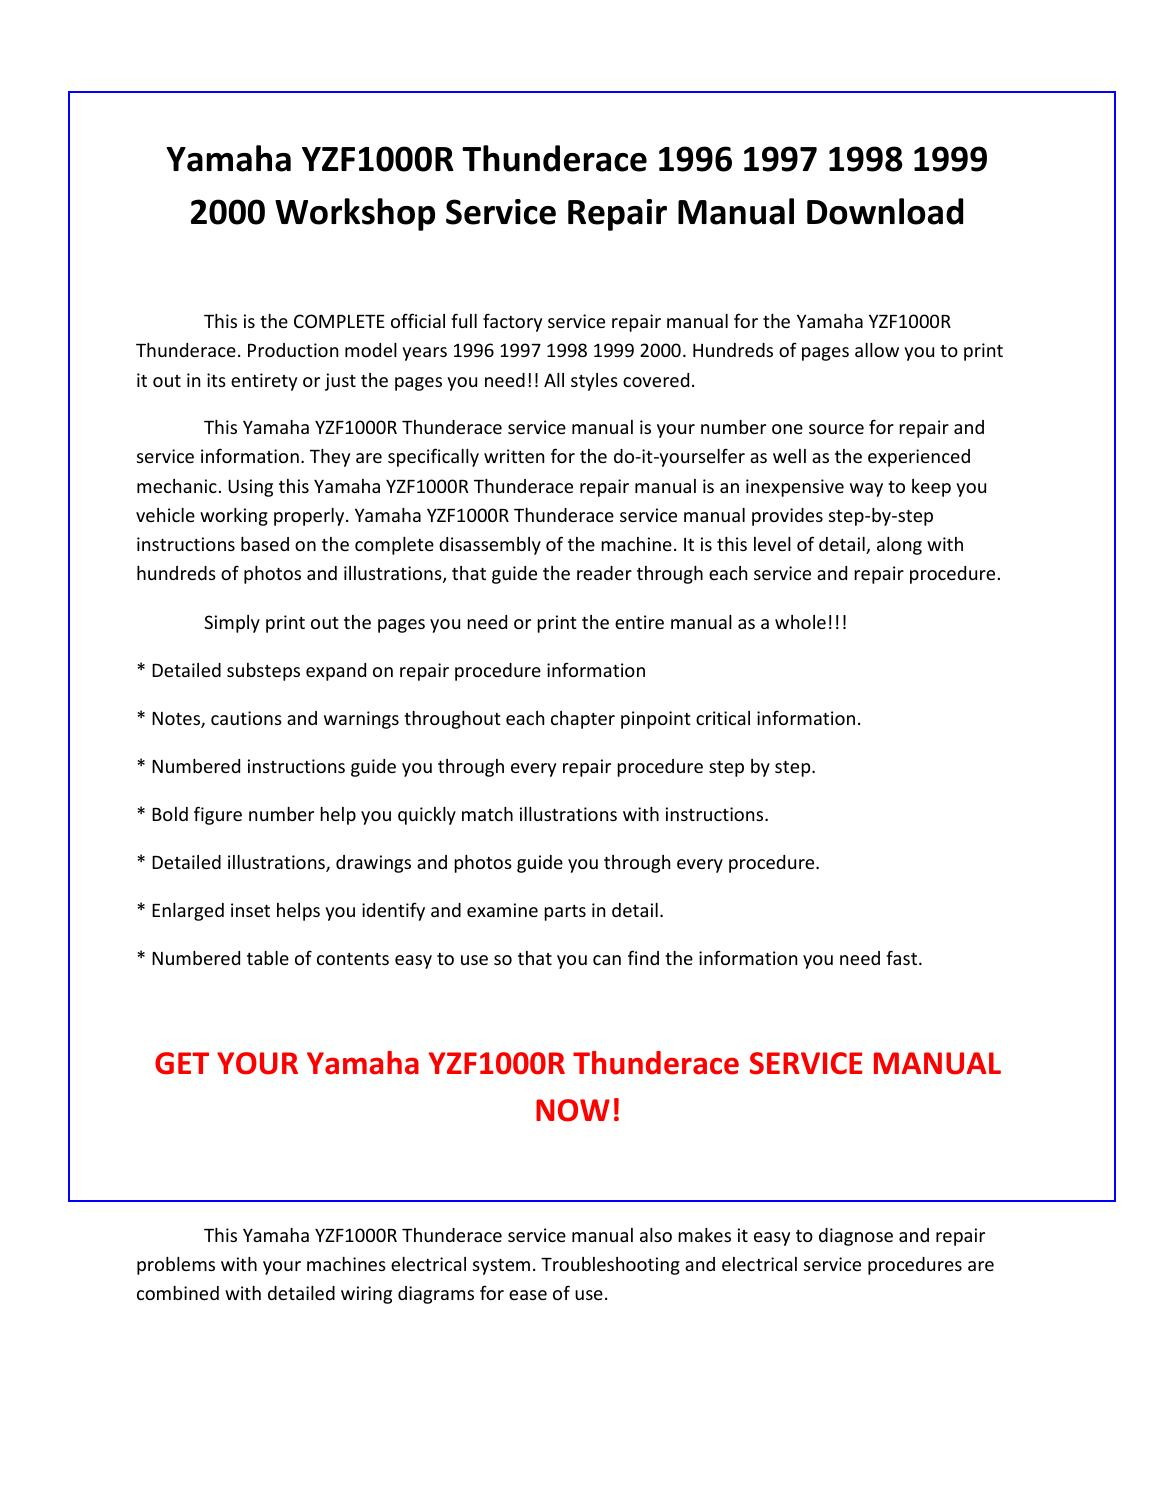 2000 yamaha r6 service manual pdf